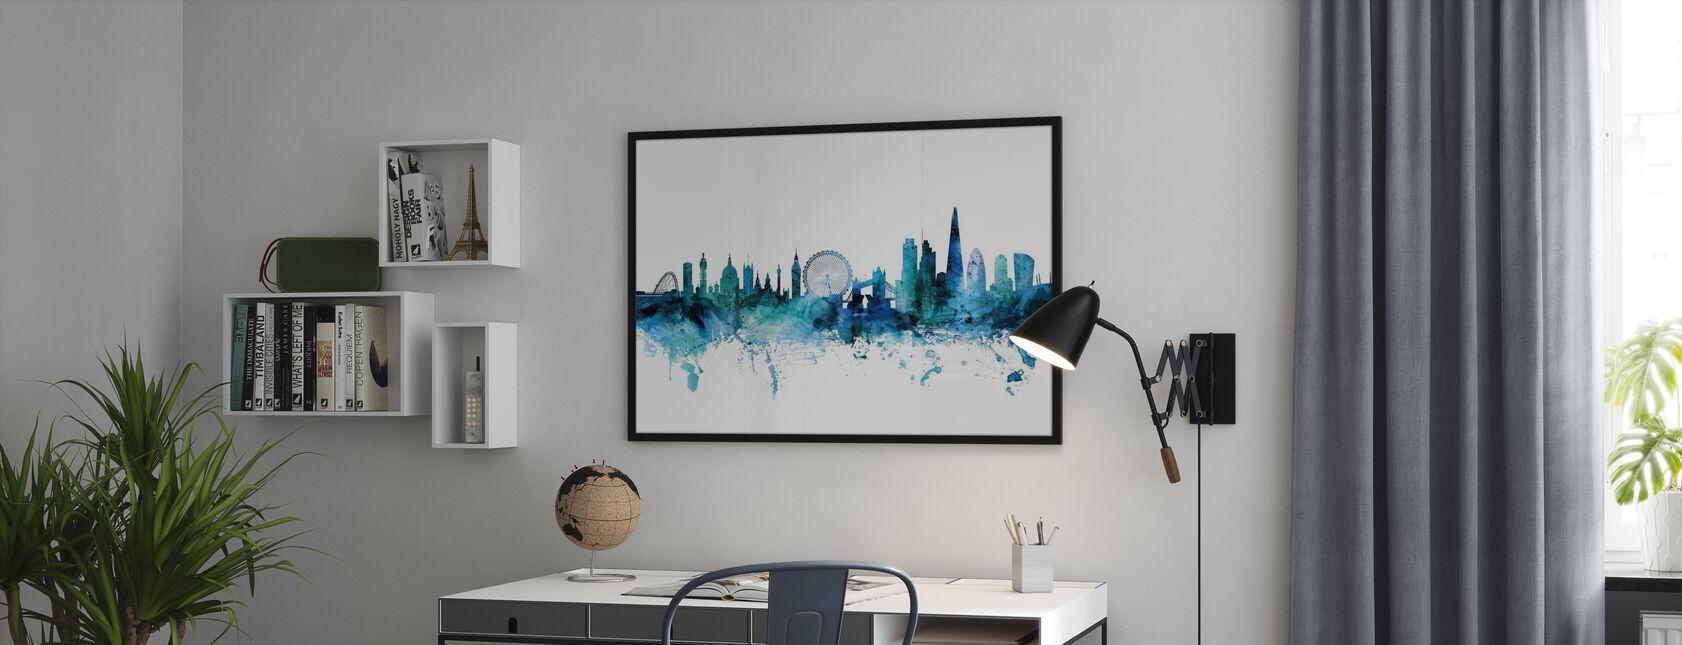 London England Skyline - Plakat - Kontor